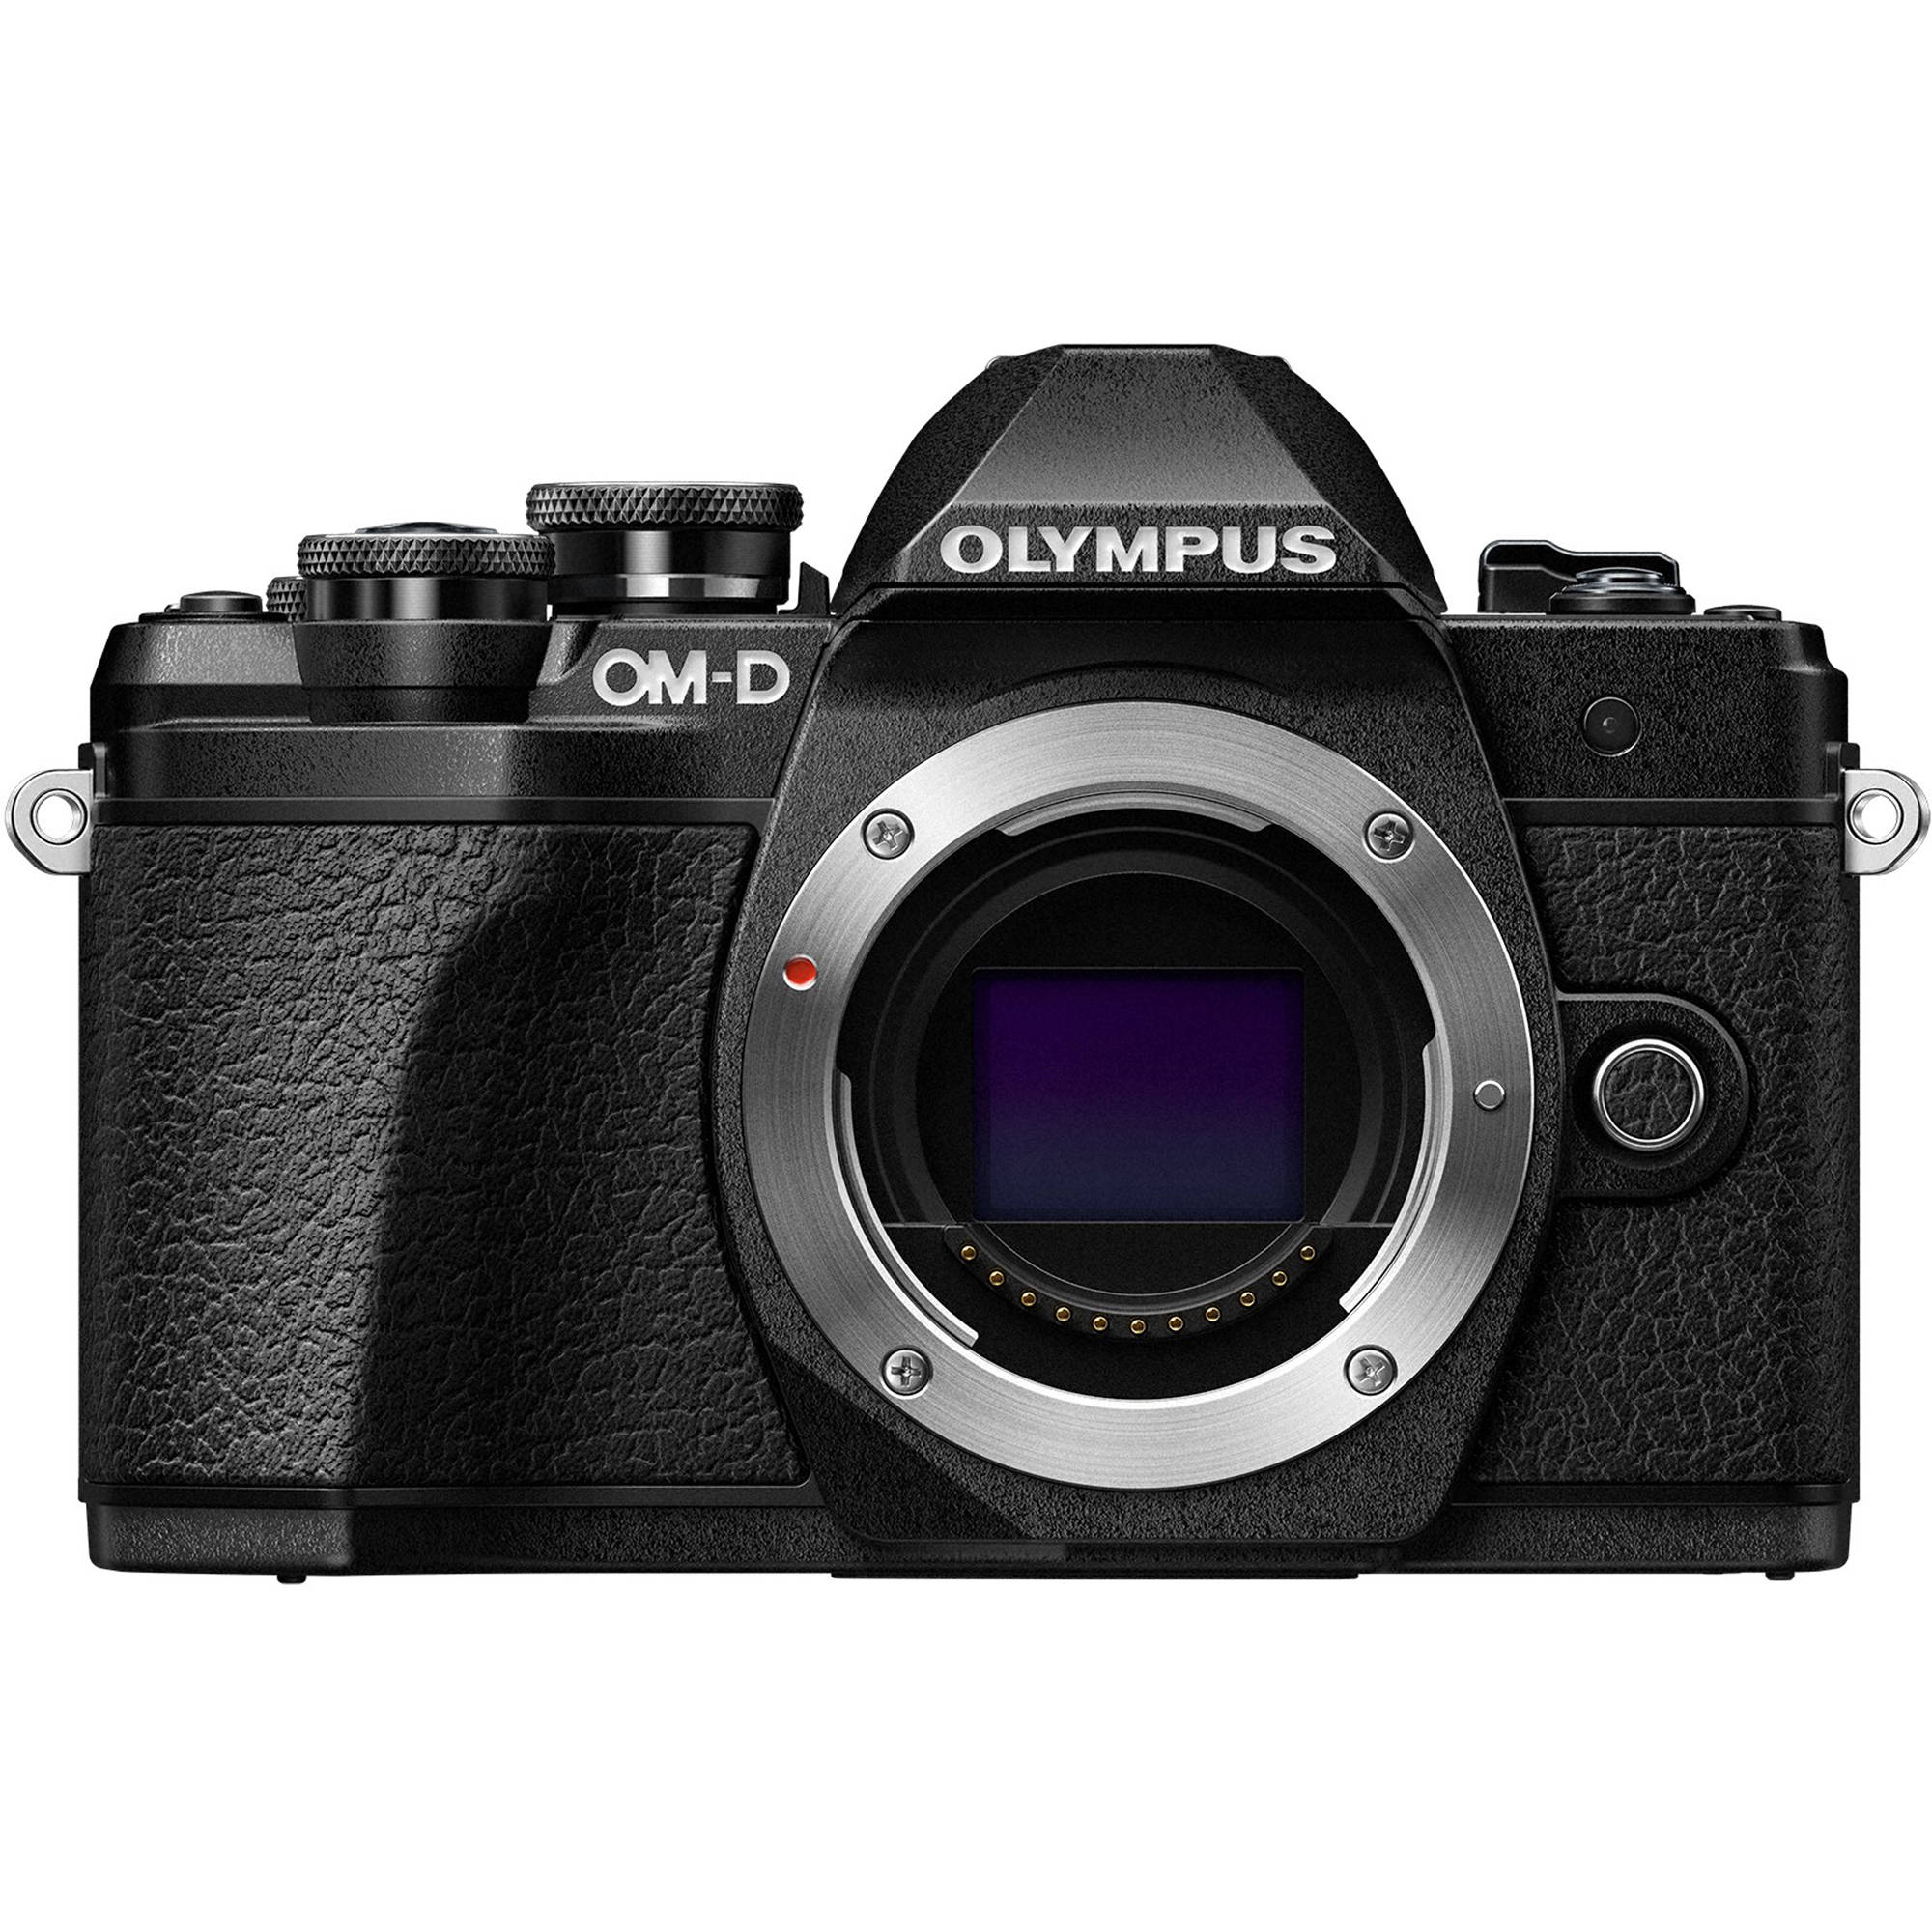 Olympus OM-D E-M10 Mark II Camera